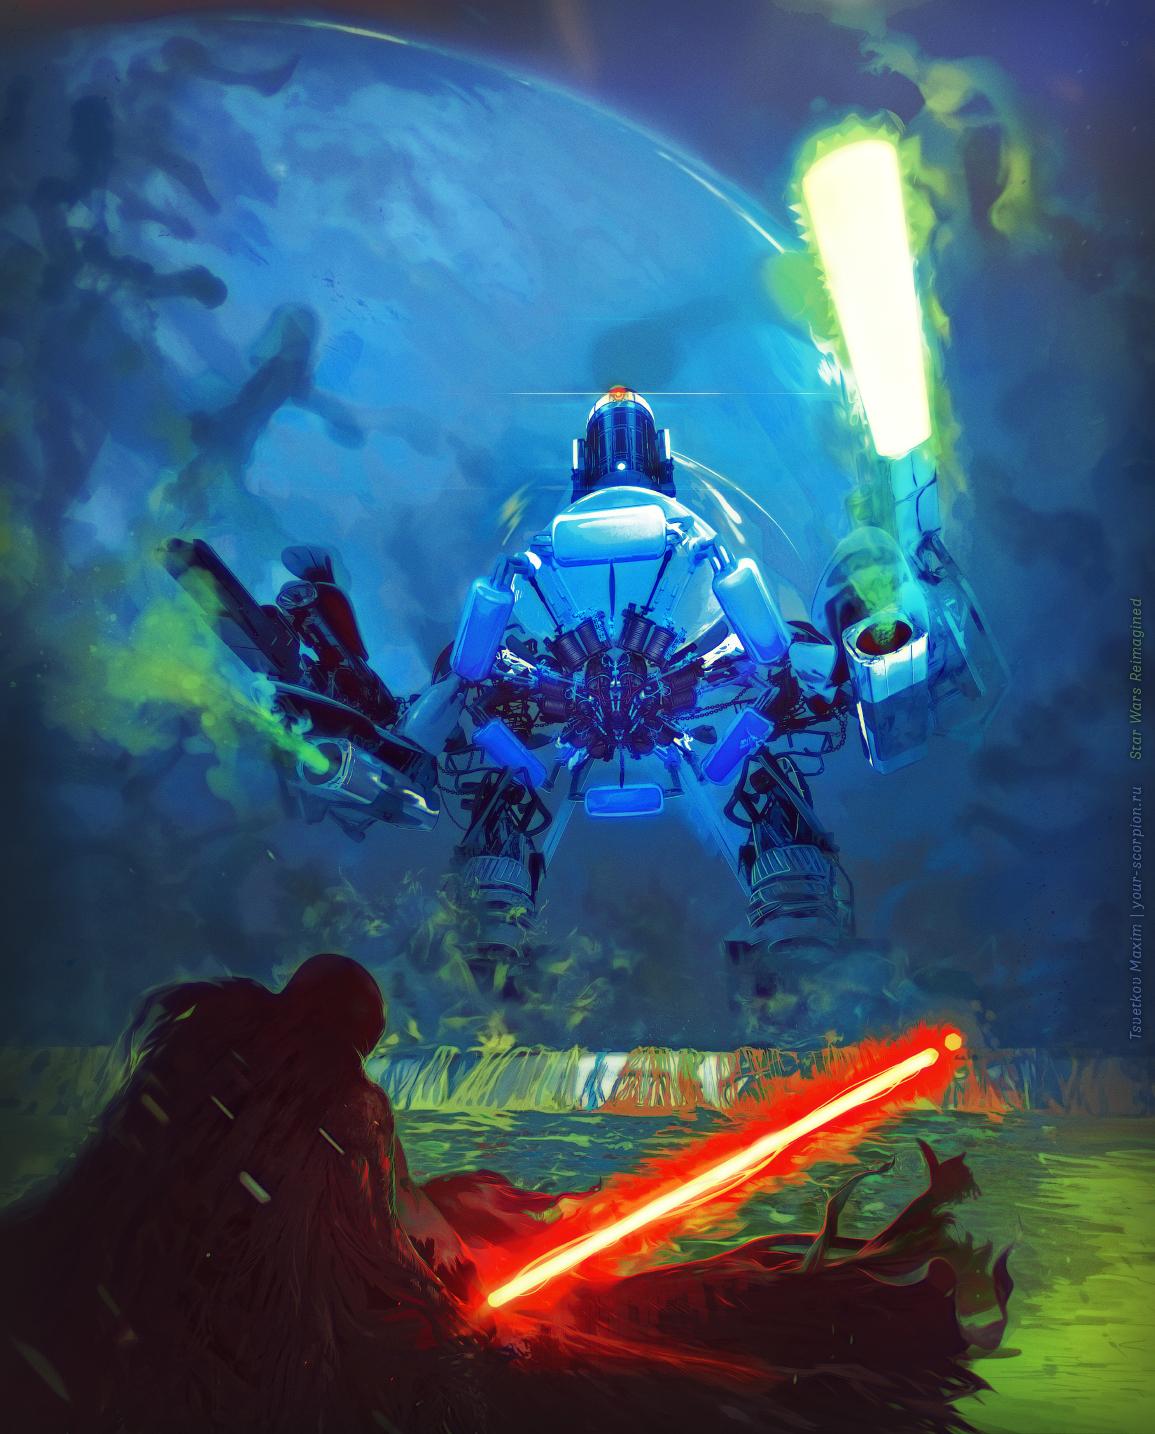 STAR WARS: REIMAGINED - Darth Vader vs. R2-D2